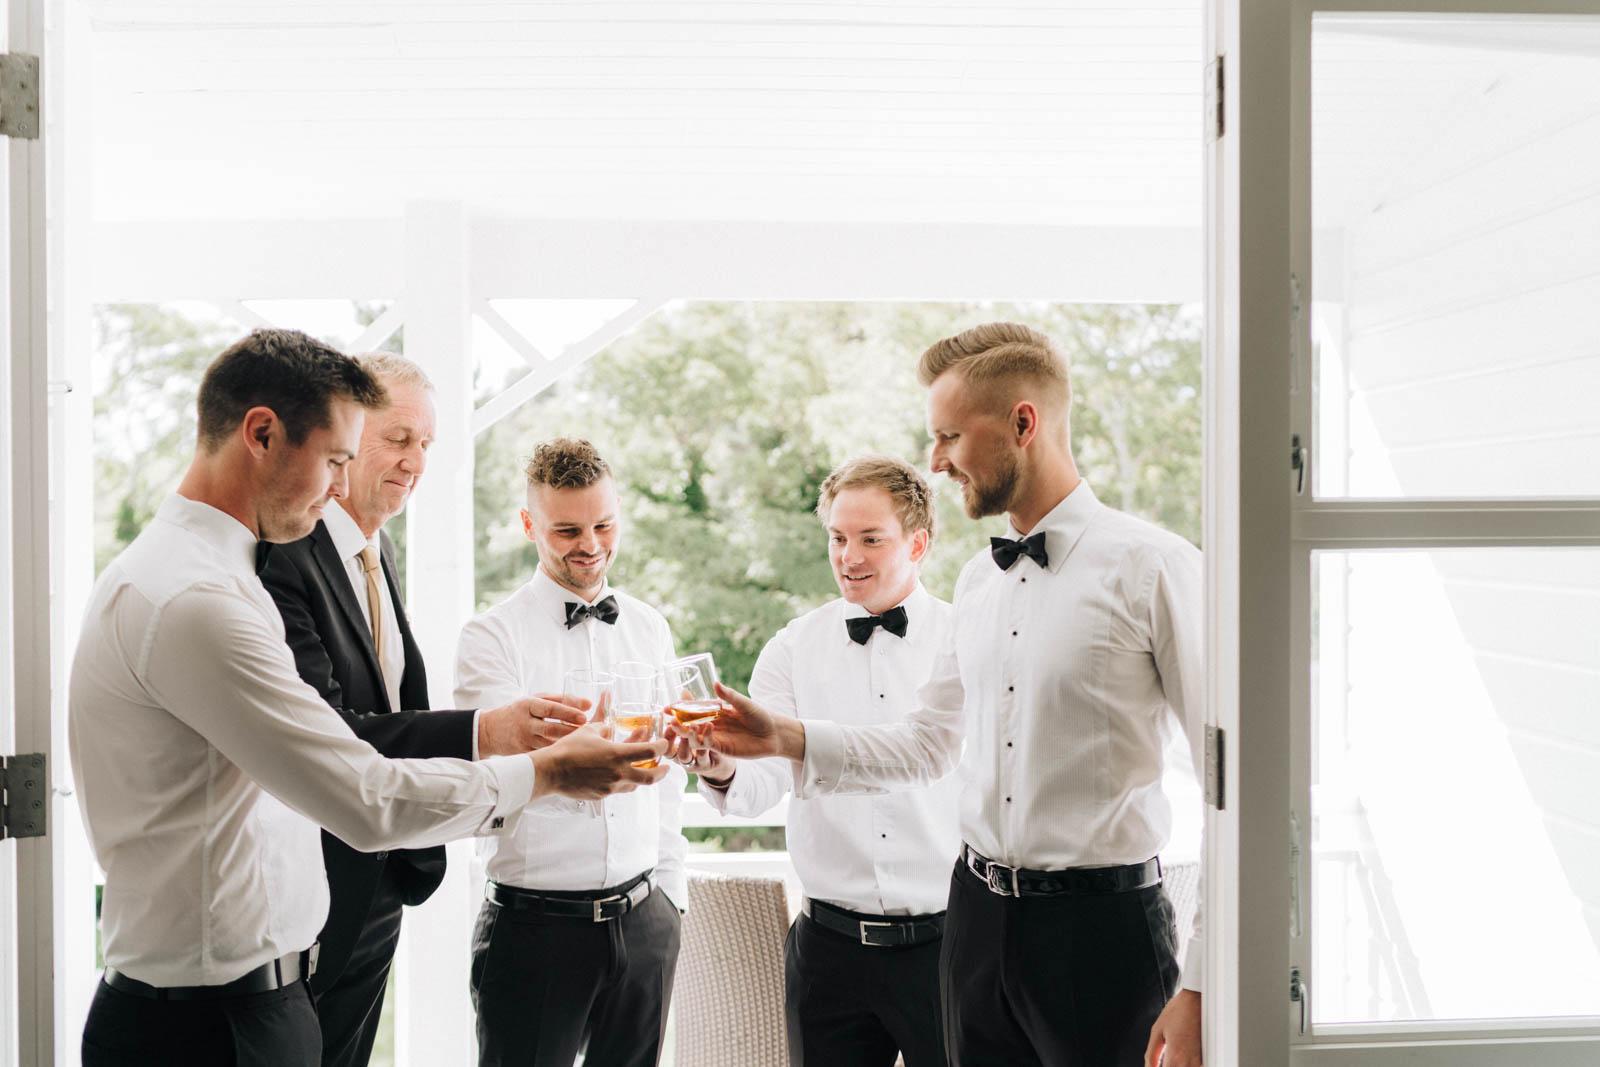 newfound-k-s-hilton-taupo-wedding-photographer-009